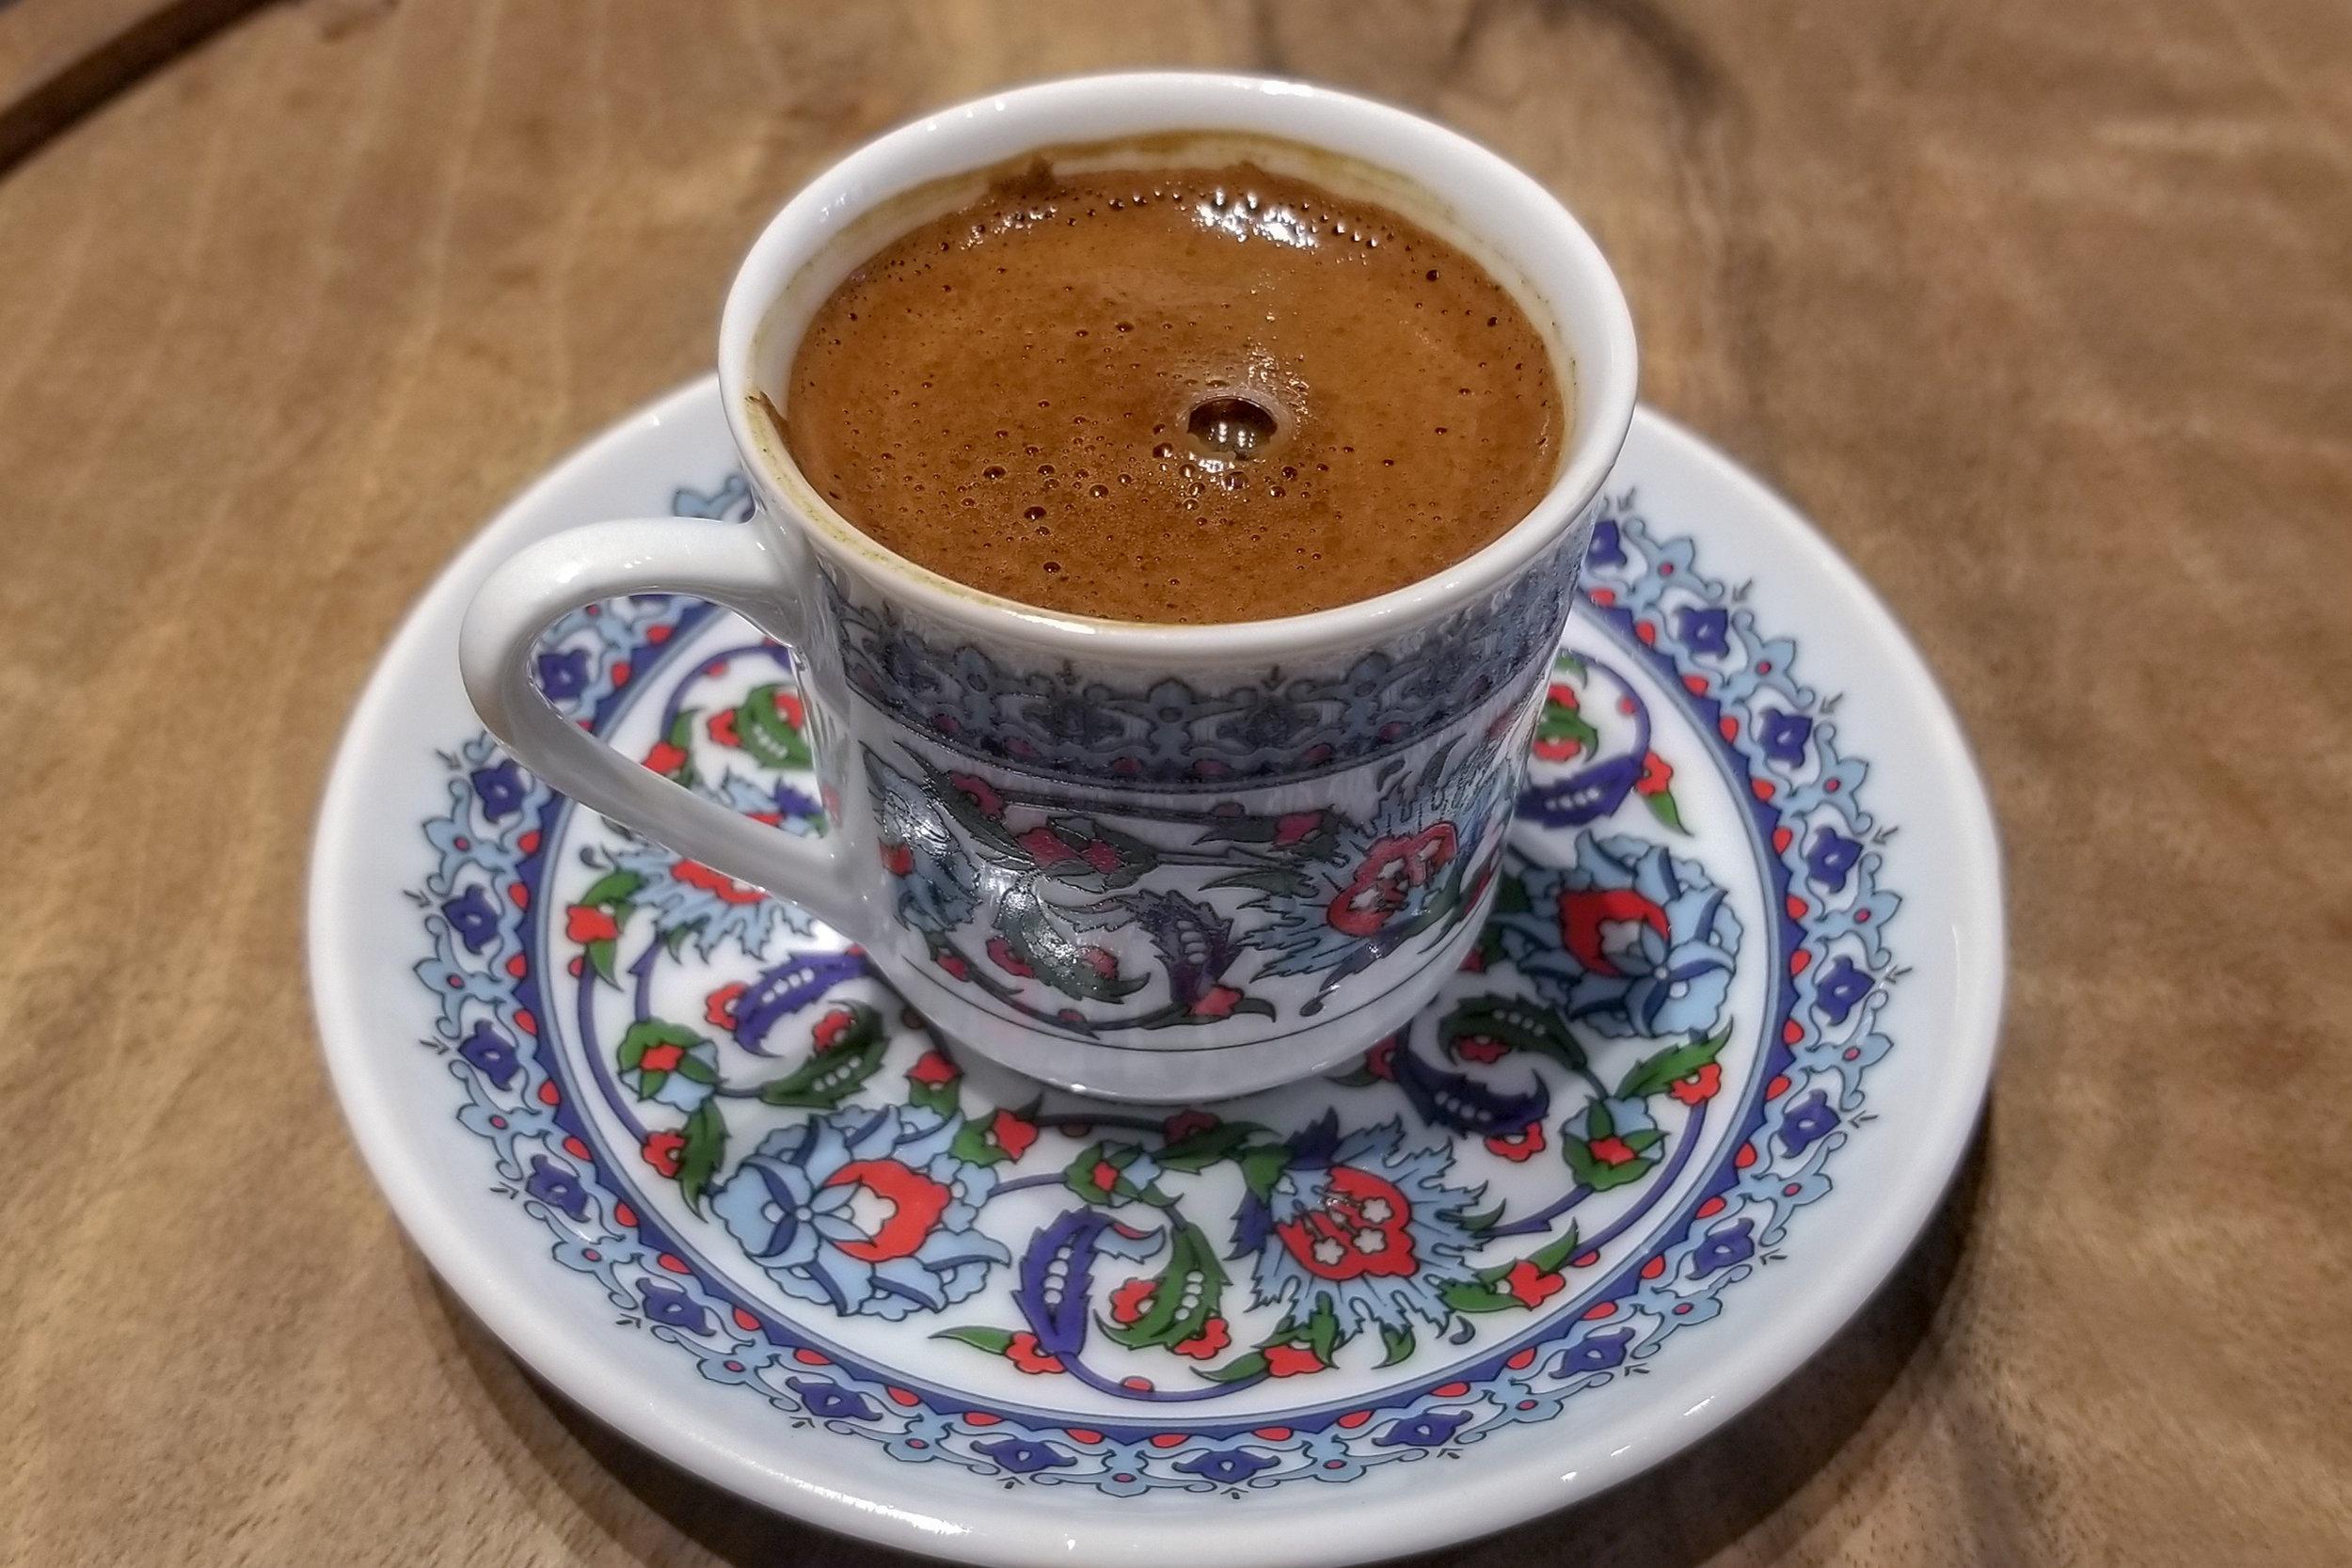 20190406 - Turkey - 0025-11.JPG